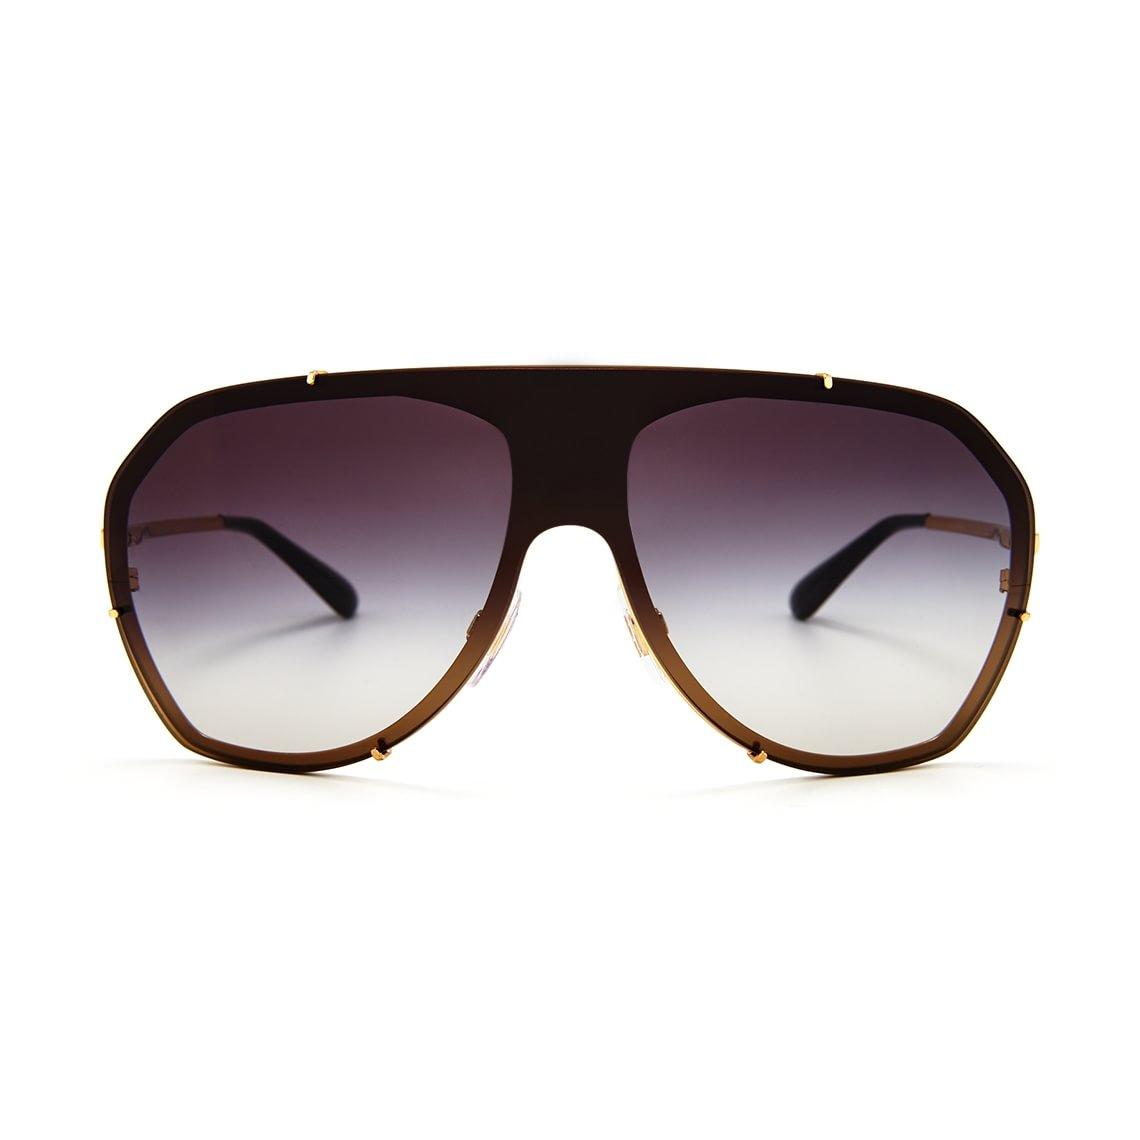 Dolce & Gabbana DG2162 02/8G 3701